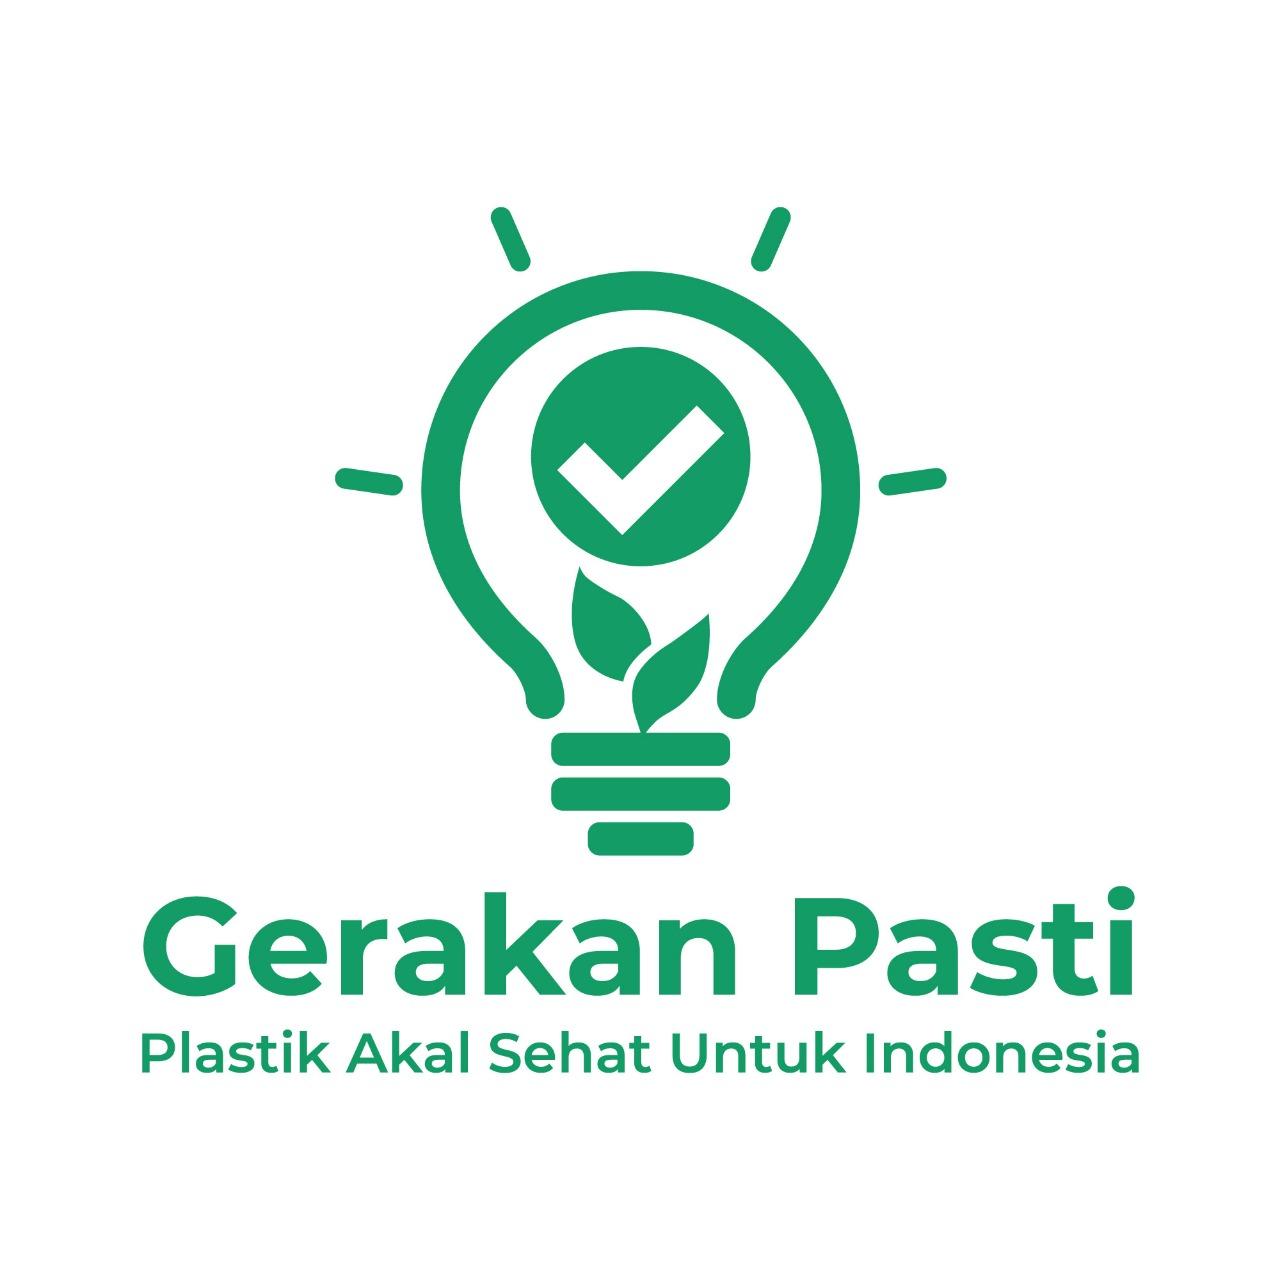 gerakanpasti.org